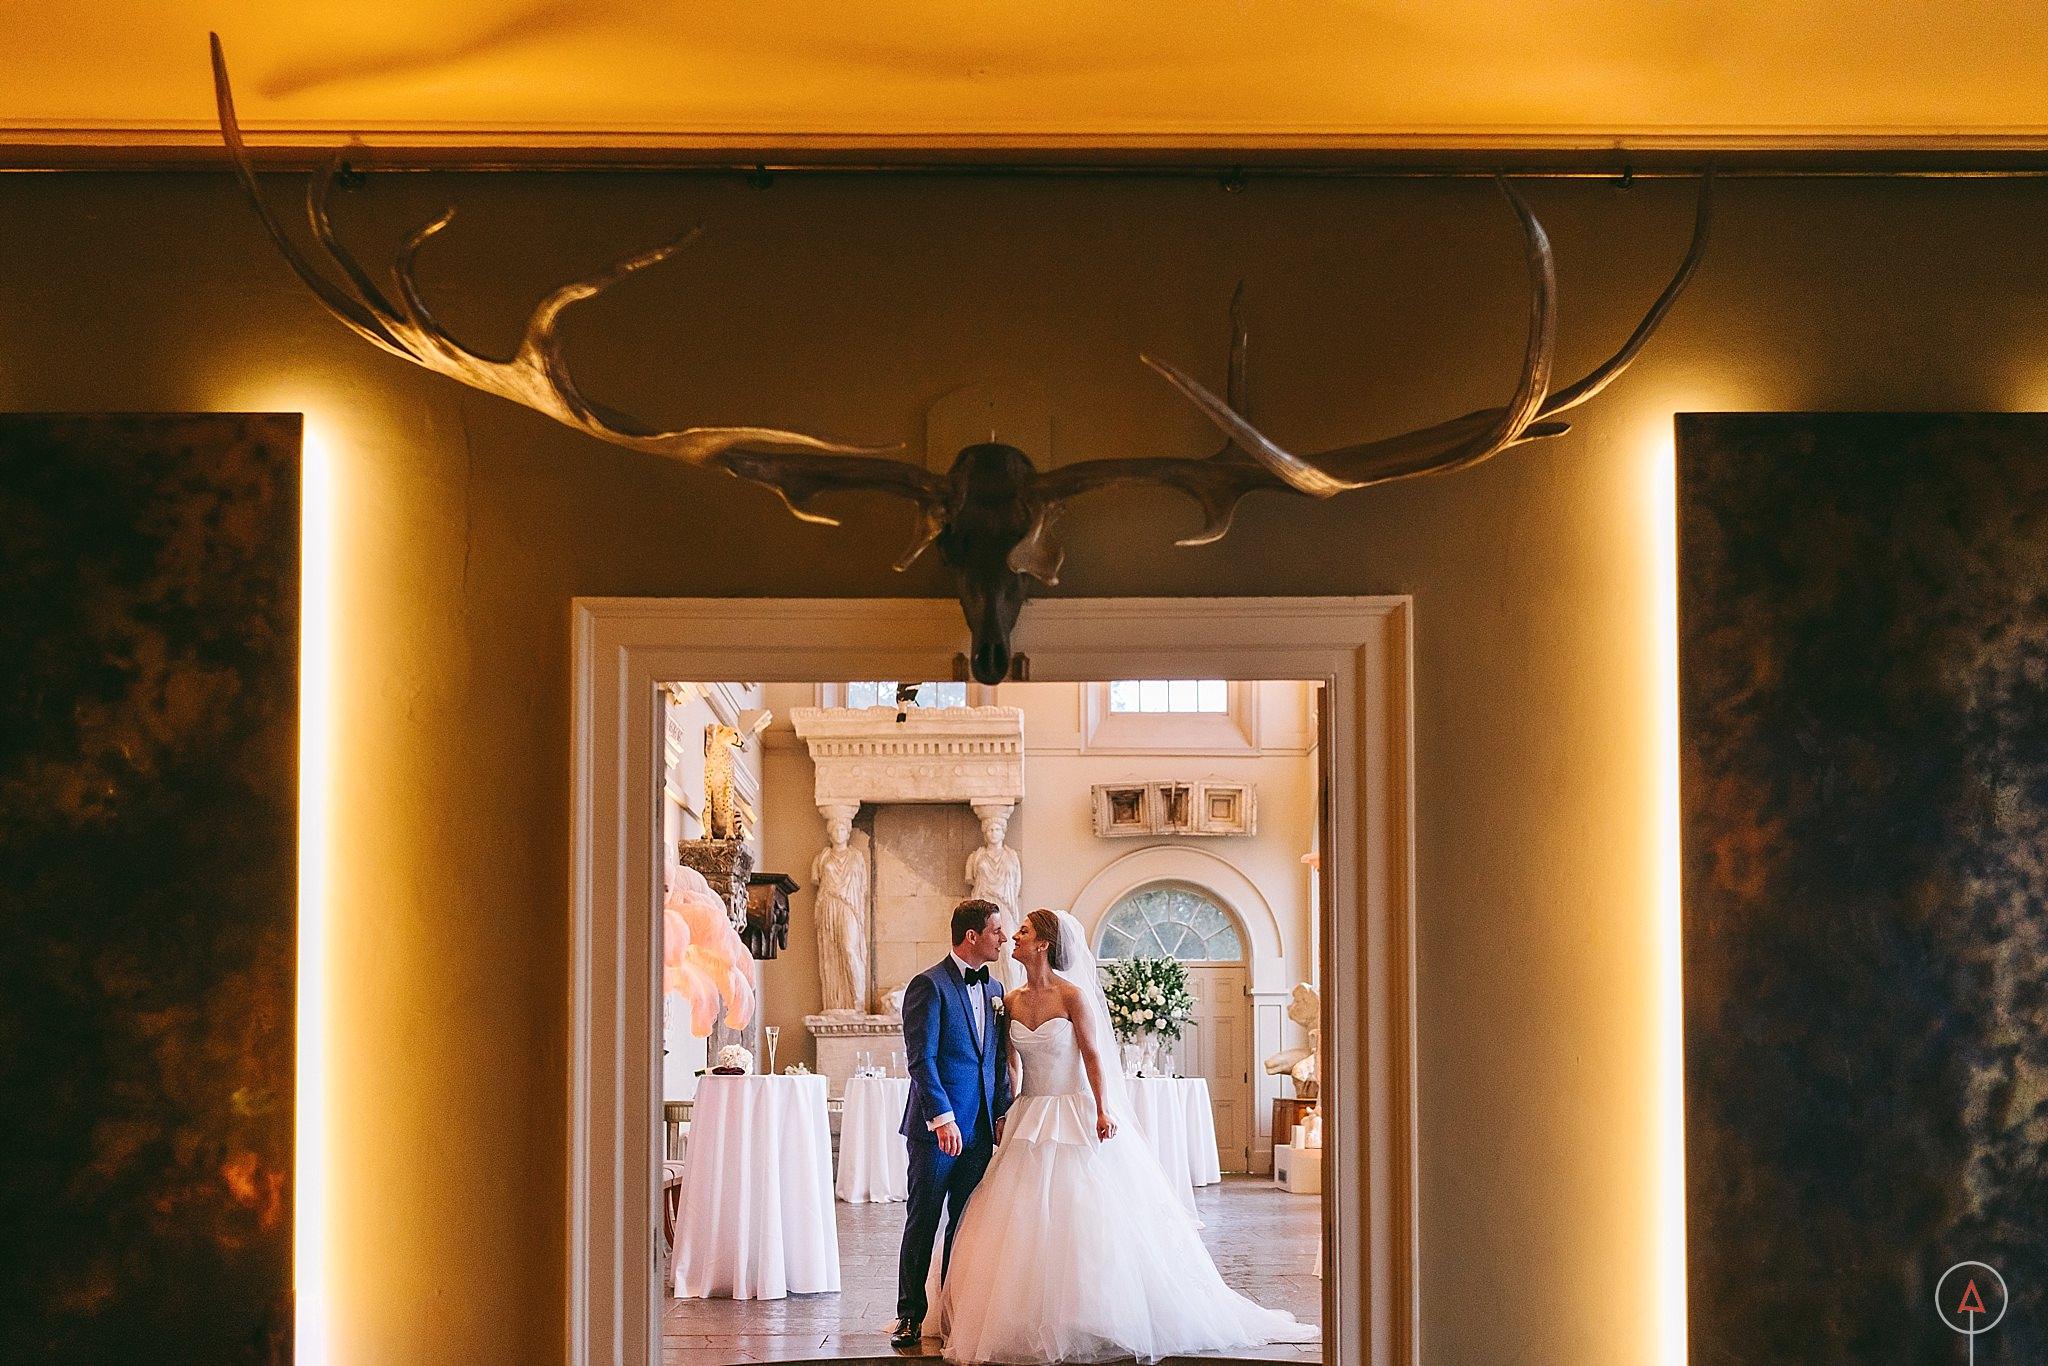 cardiff-wedding-photographer-aga-tomaszek_0297